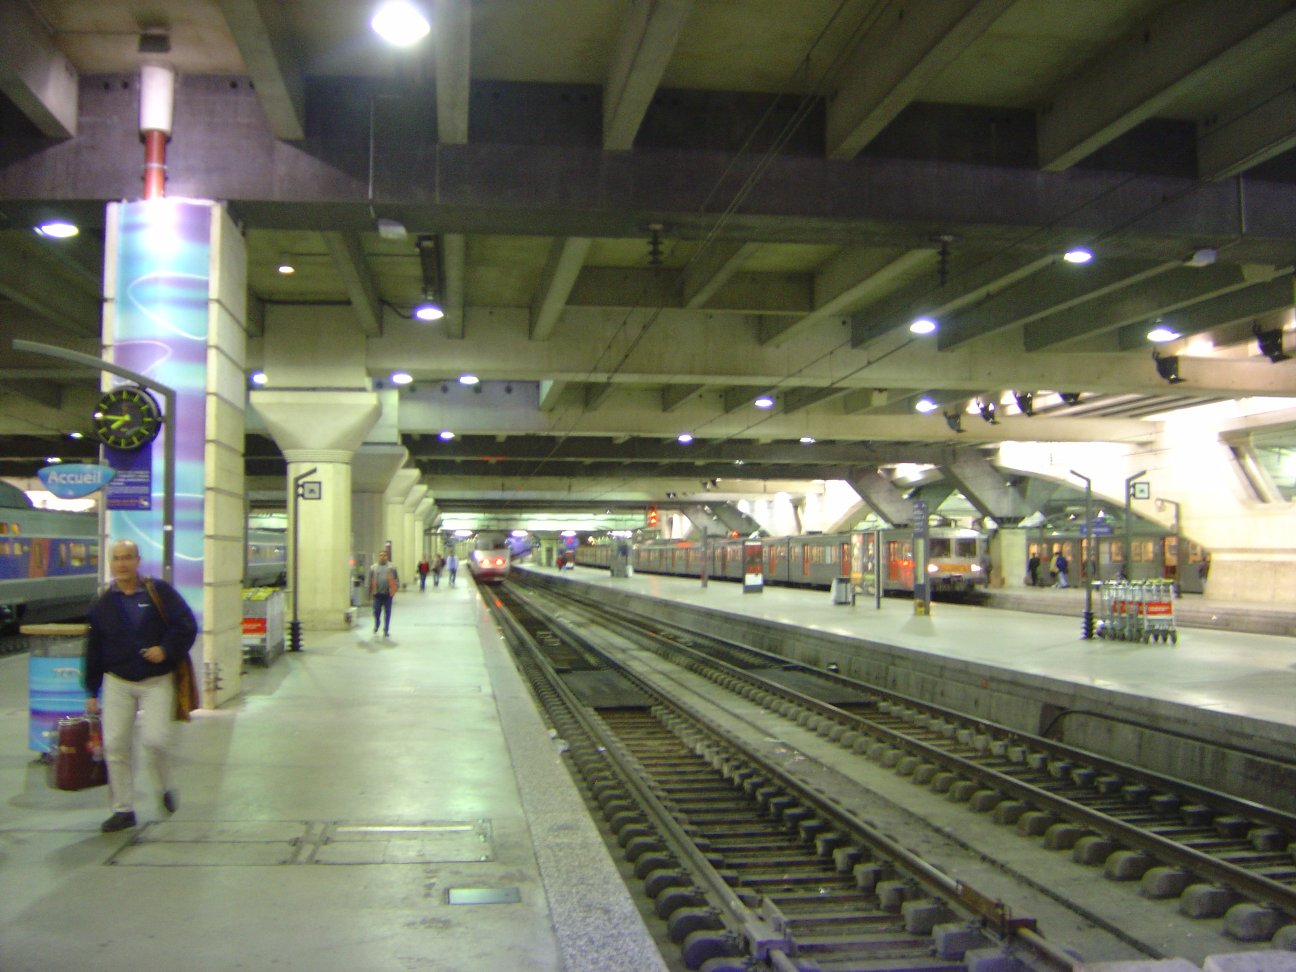 Gare de paris montparnasse for Plan interieur gare montparnasse